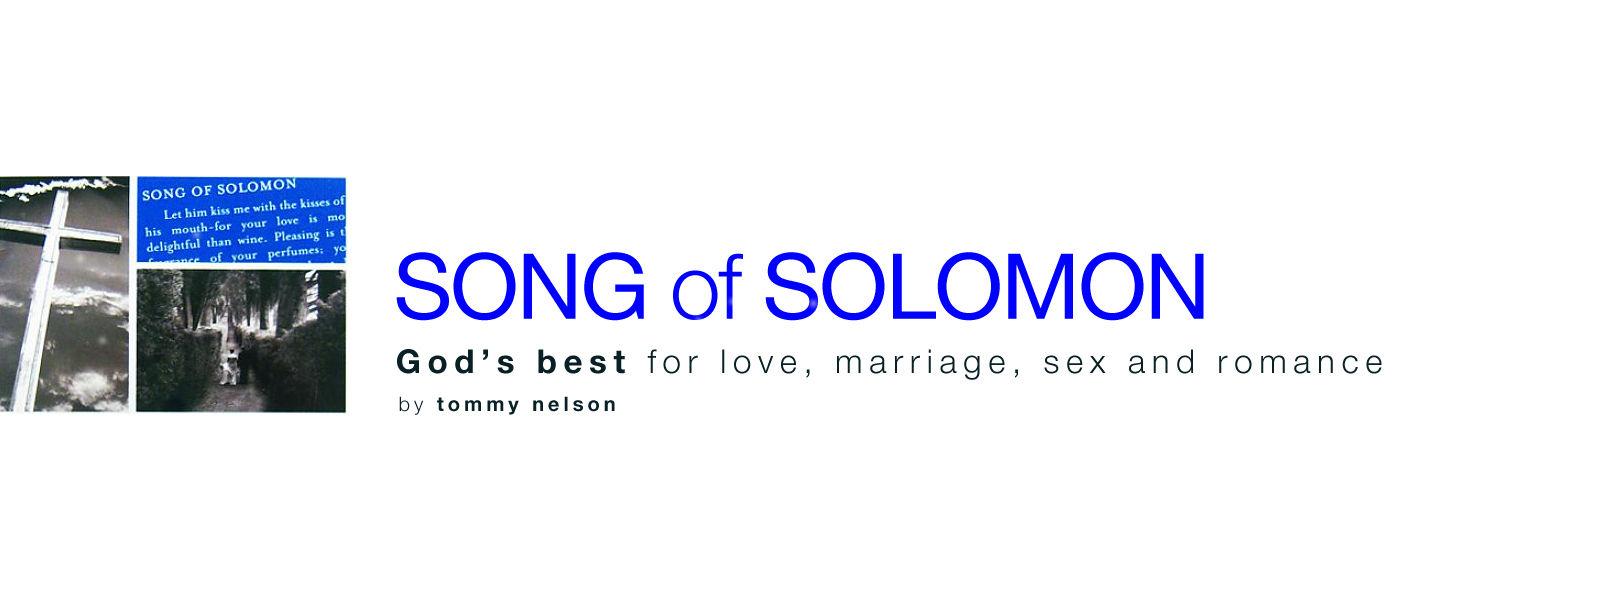 Song of Solomon 2005